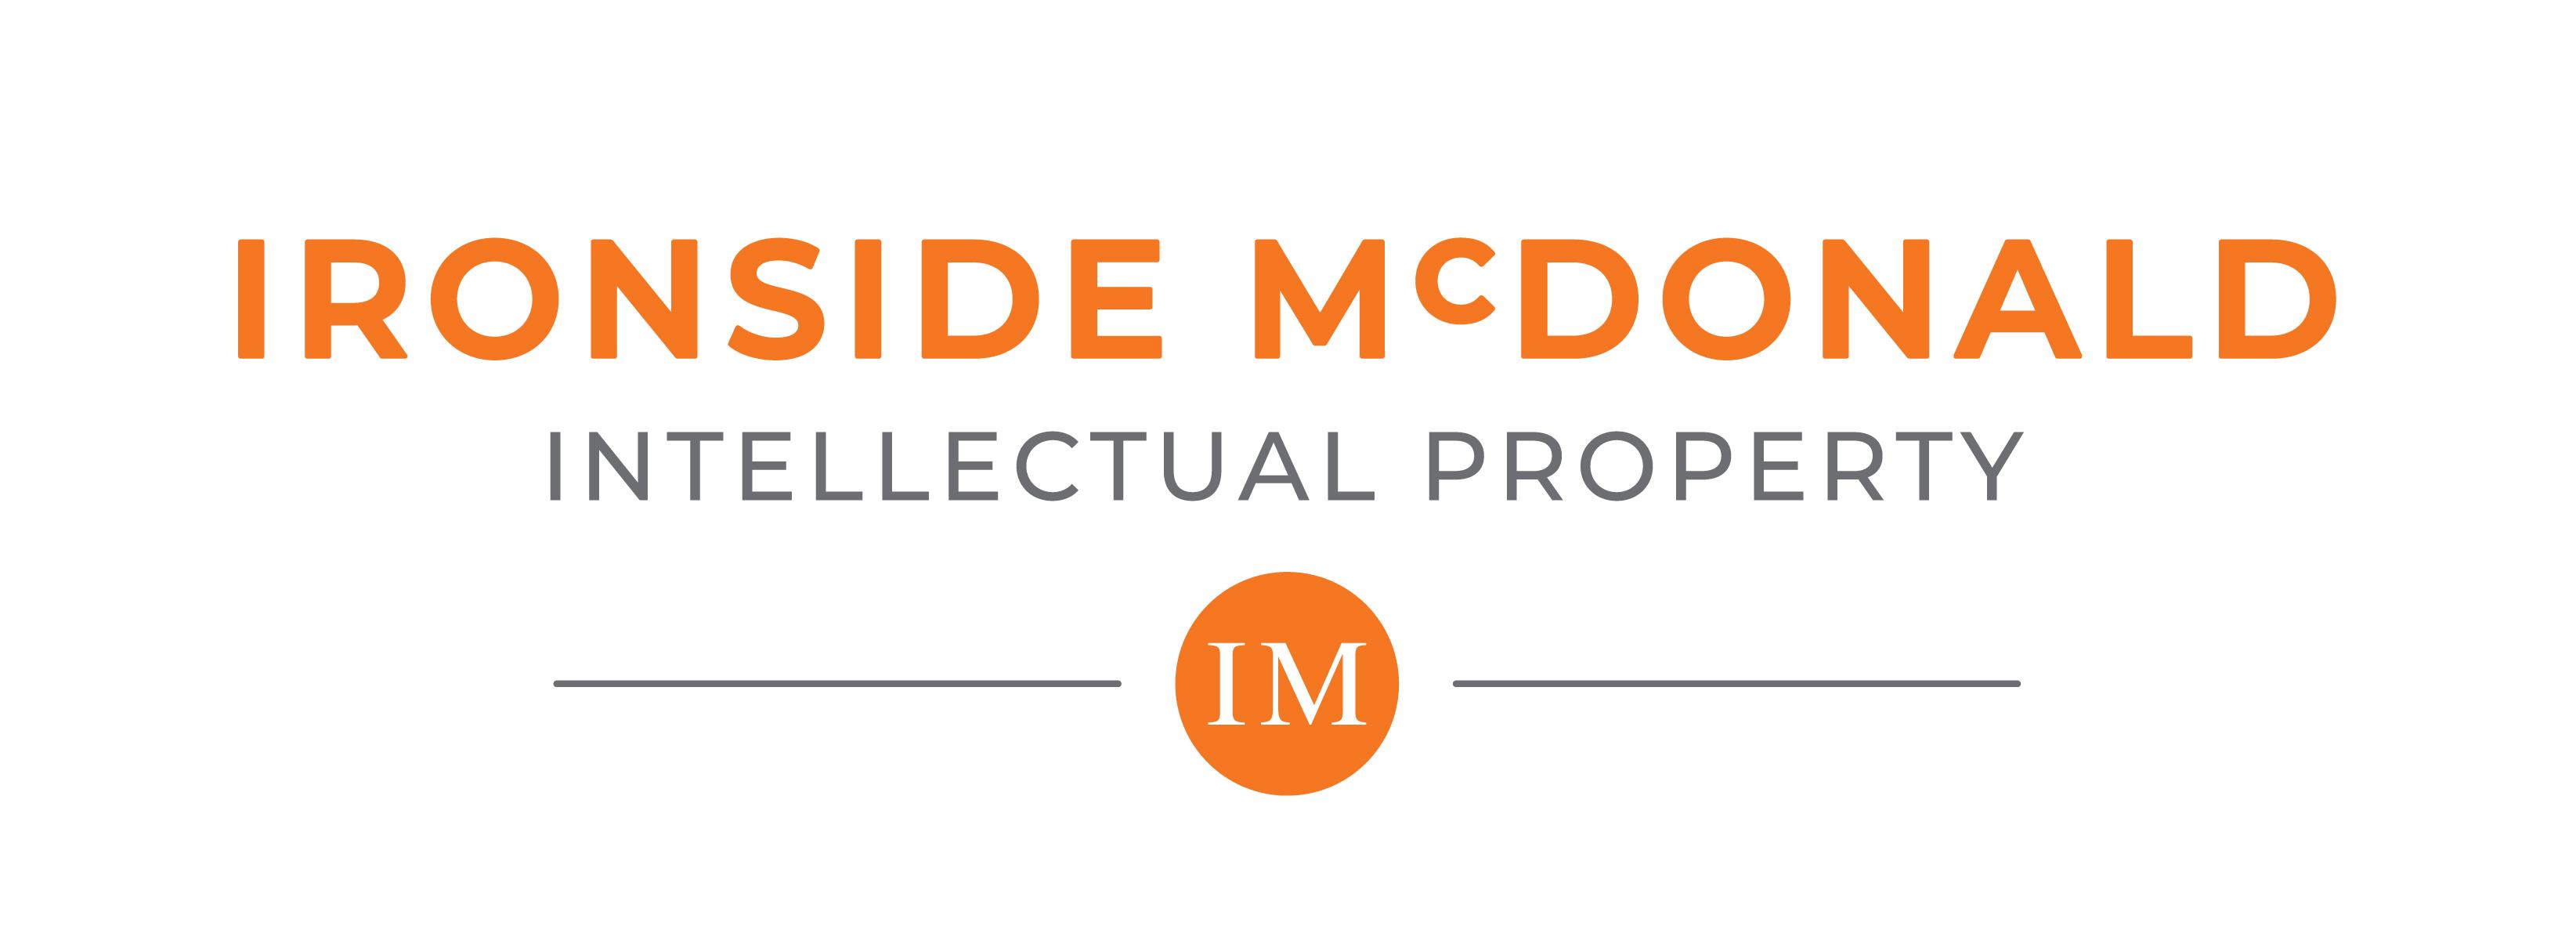 Ironside McDonald Intellectual Property